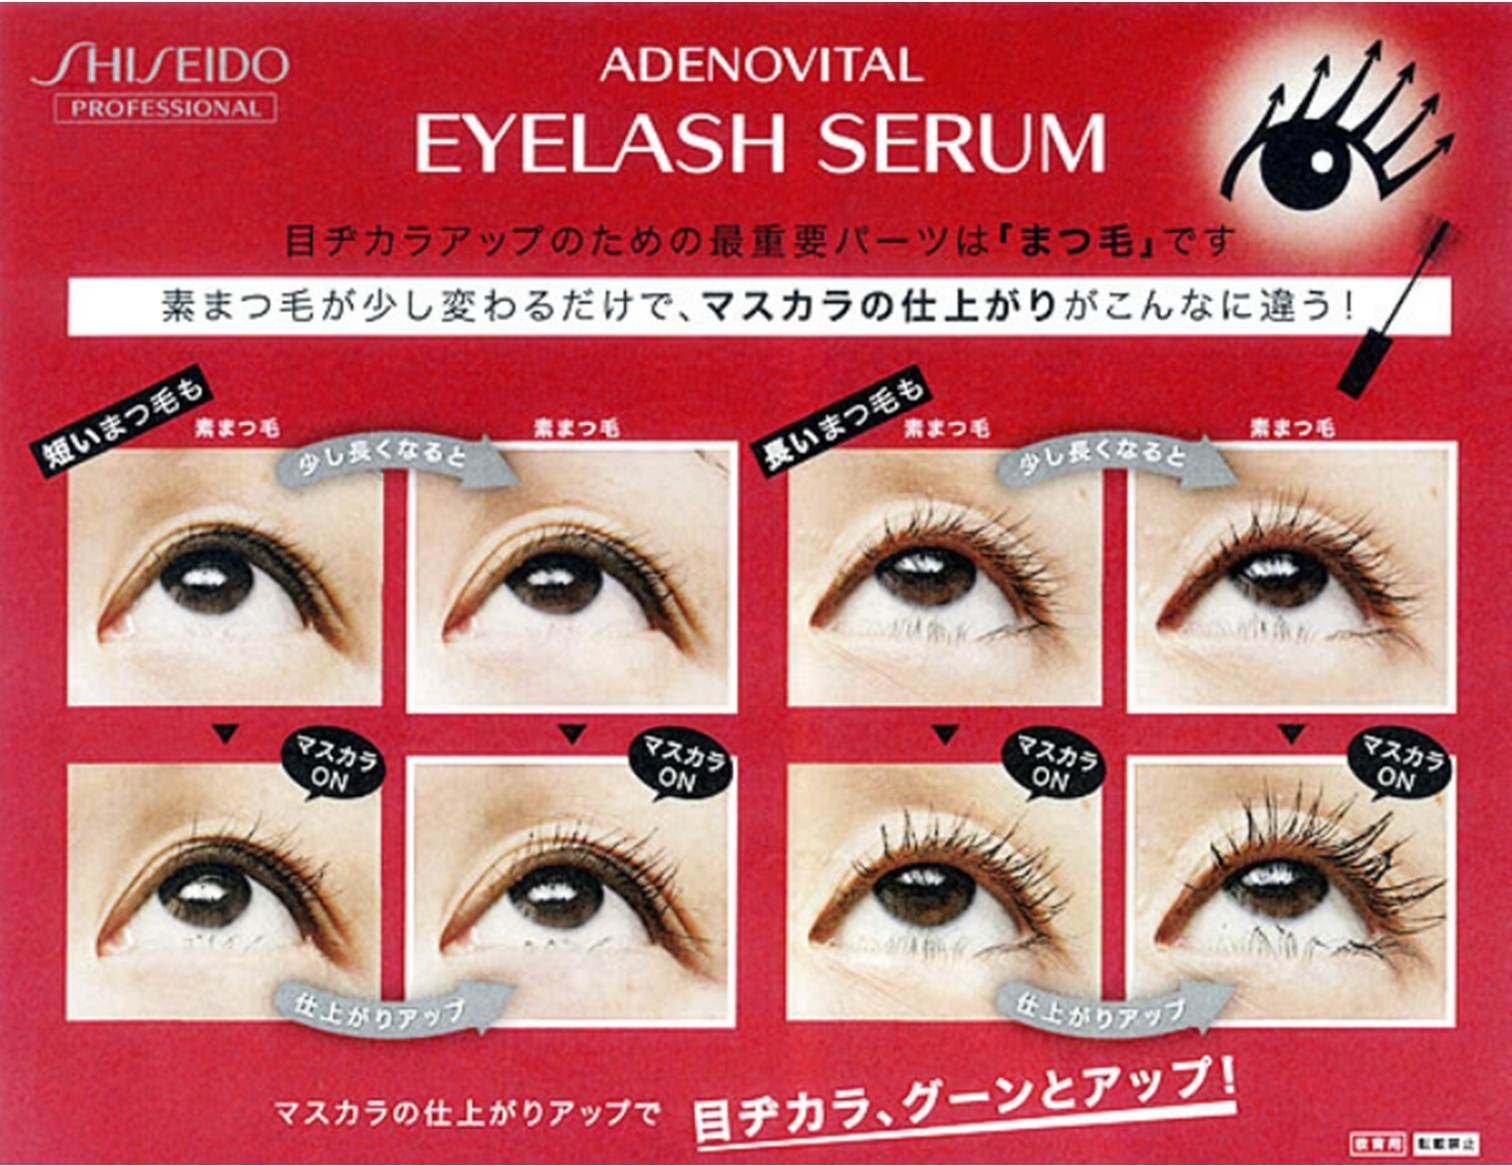 404e0d7316a Adenovital Eyelash Serum - an indispensable item for longer and thicker  eyelashes.